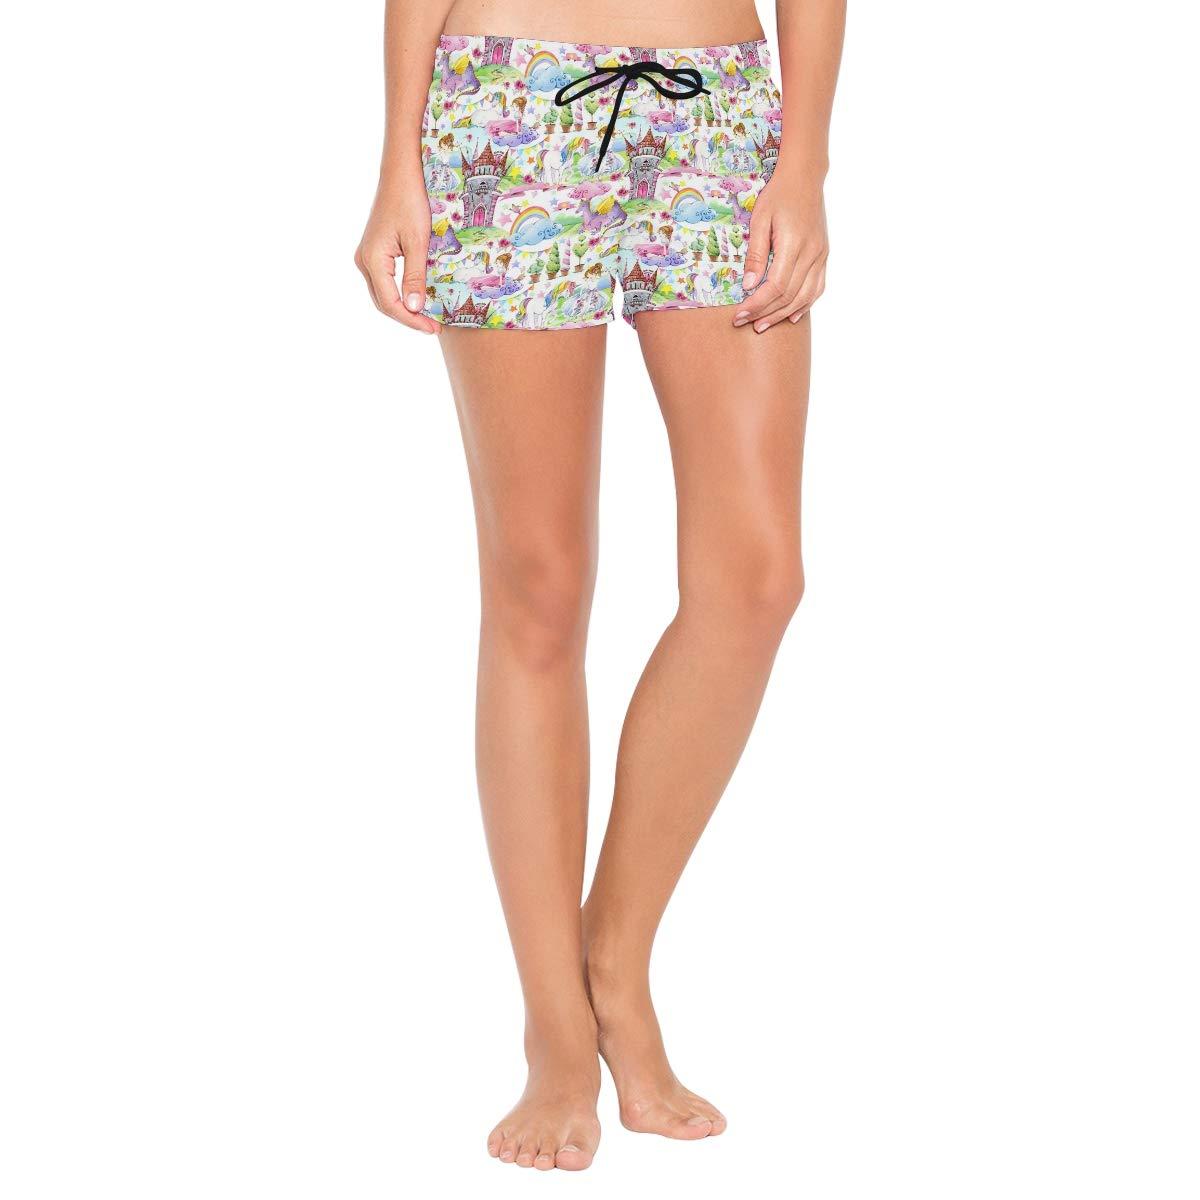 Womens Castle Princess Unicorn Rainbow Shorts Swimwear Running Shorts Beach Shorts for Women